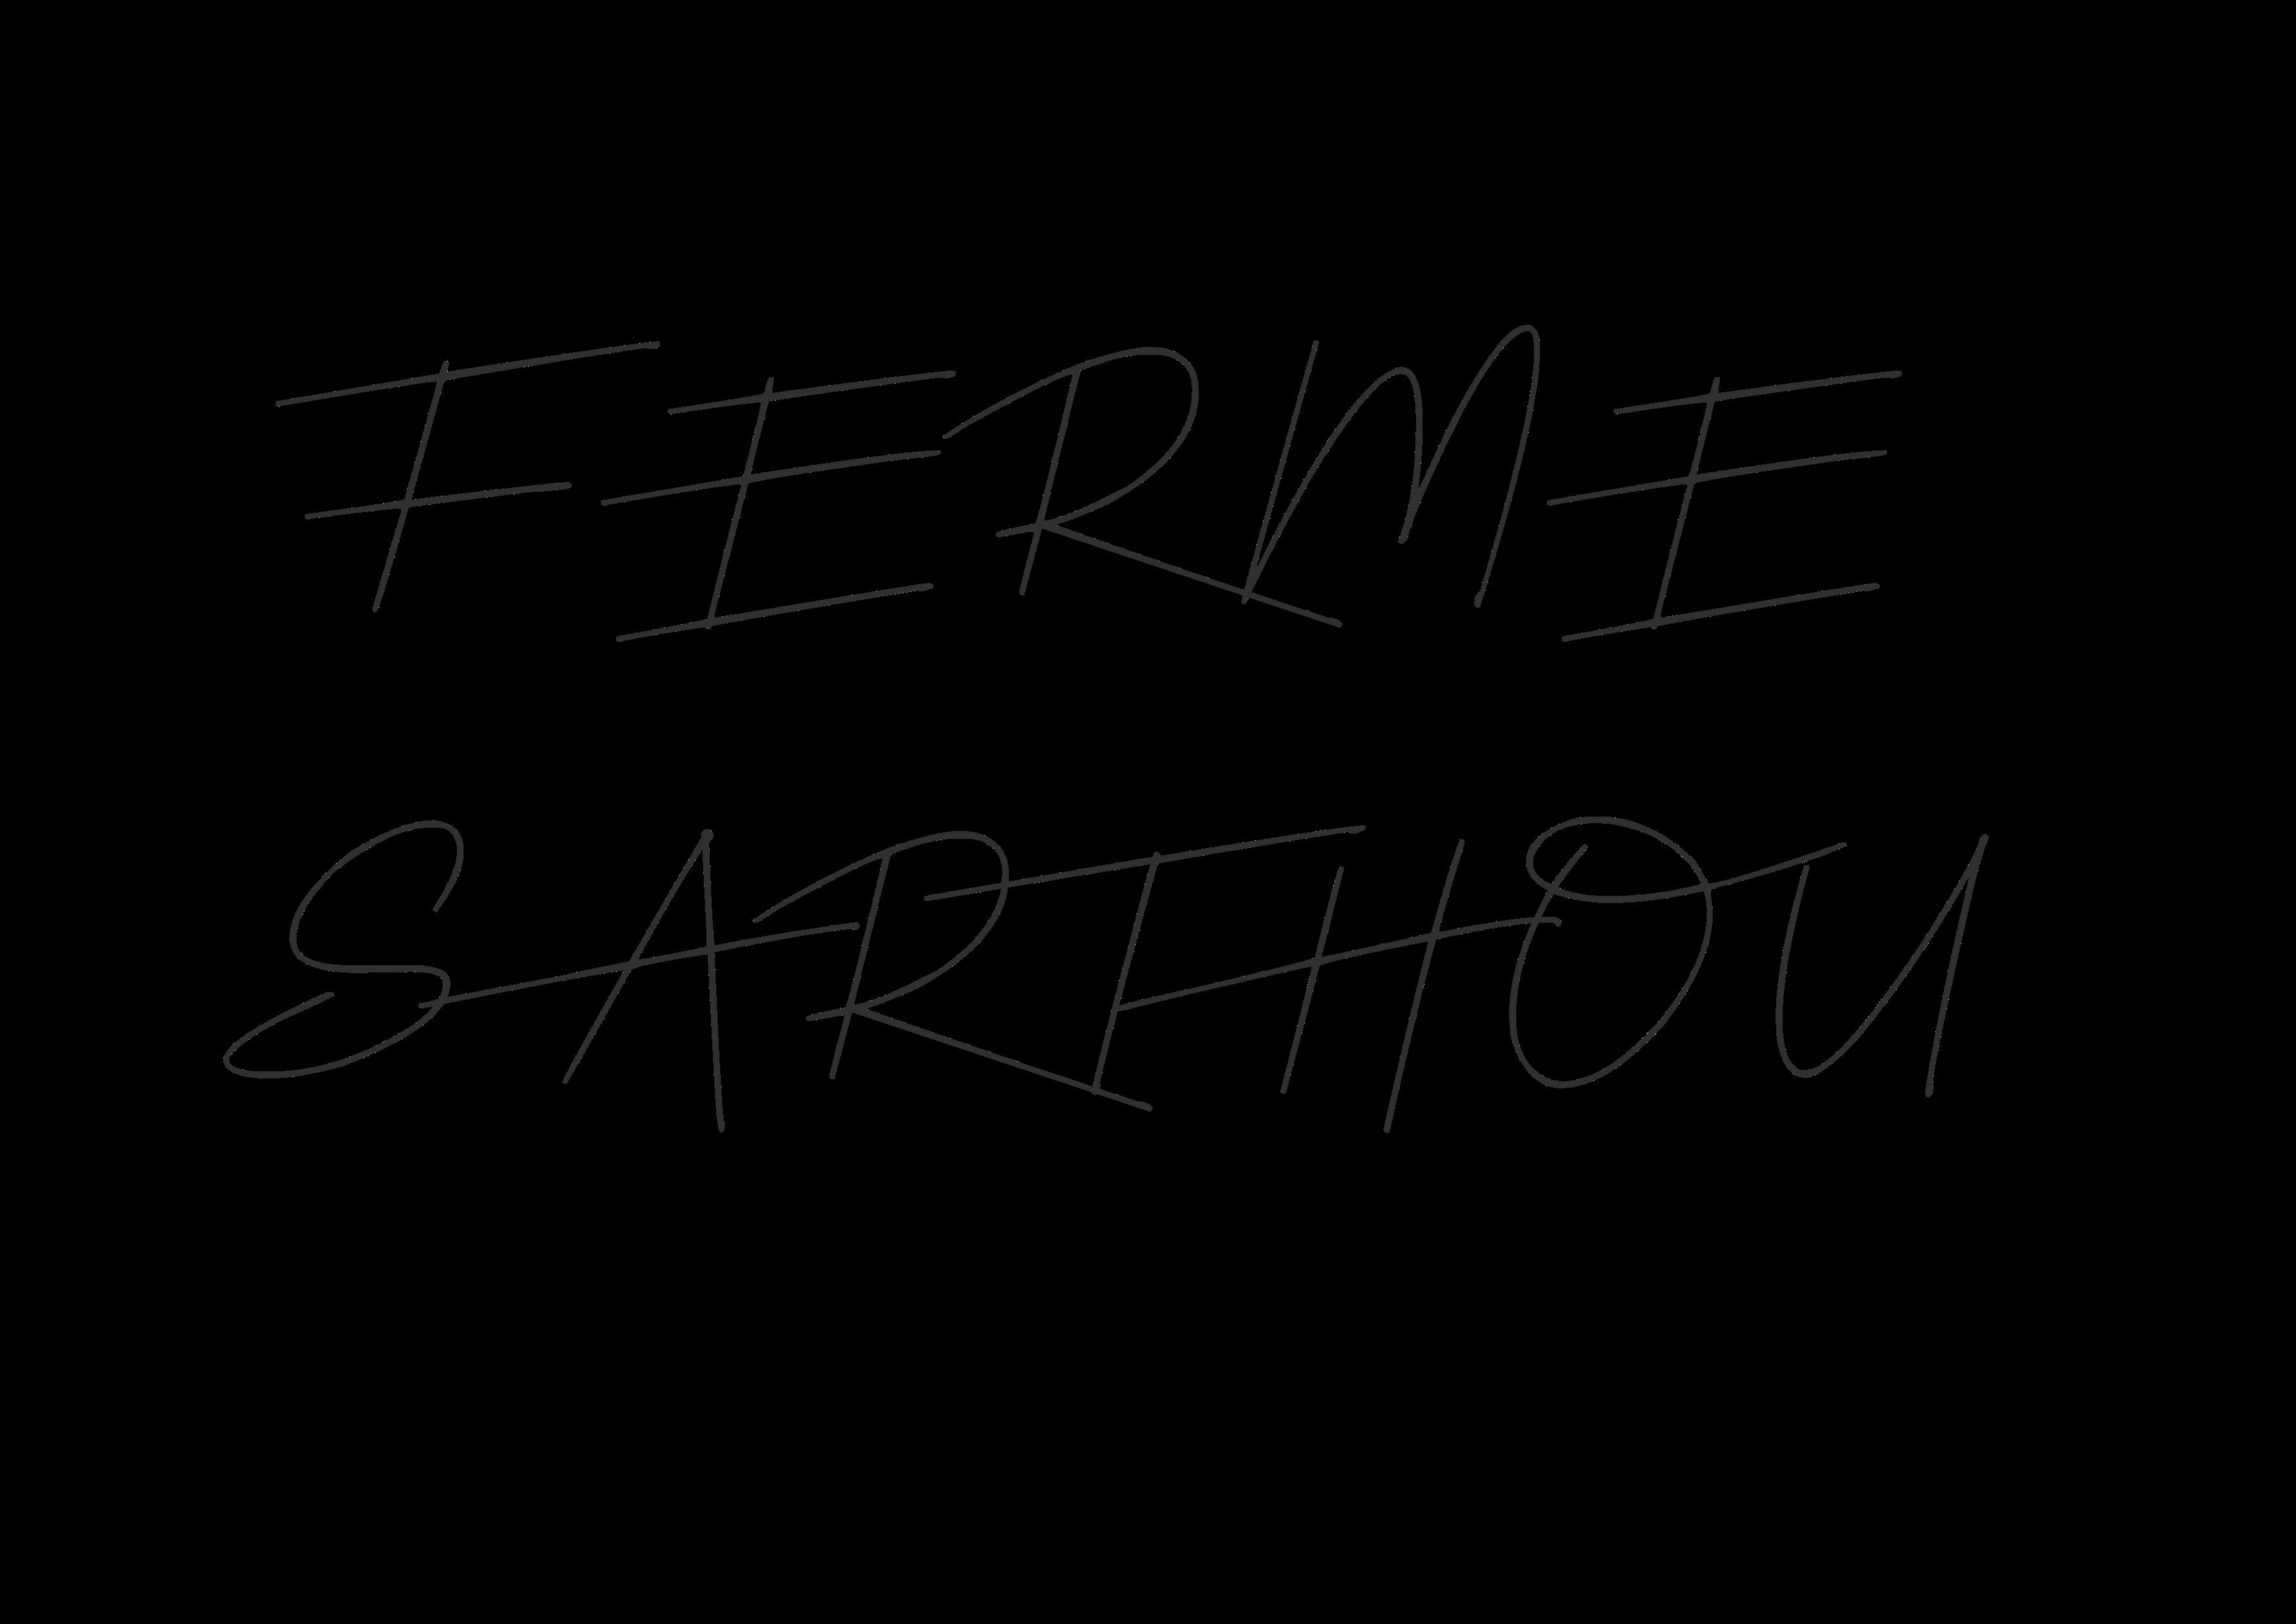 Ferme Sarthou